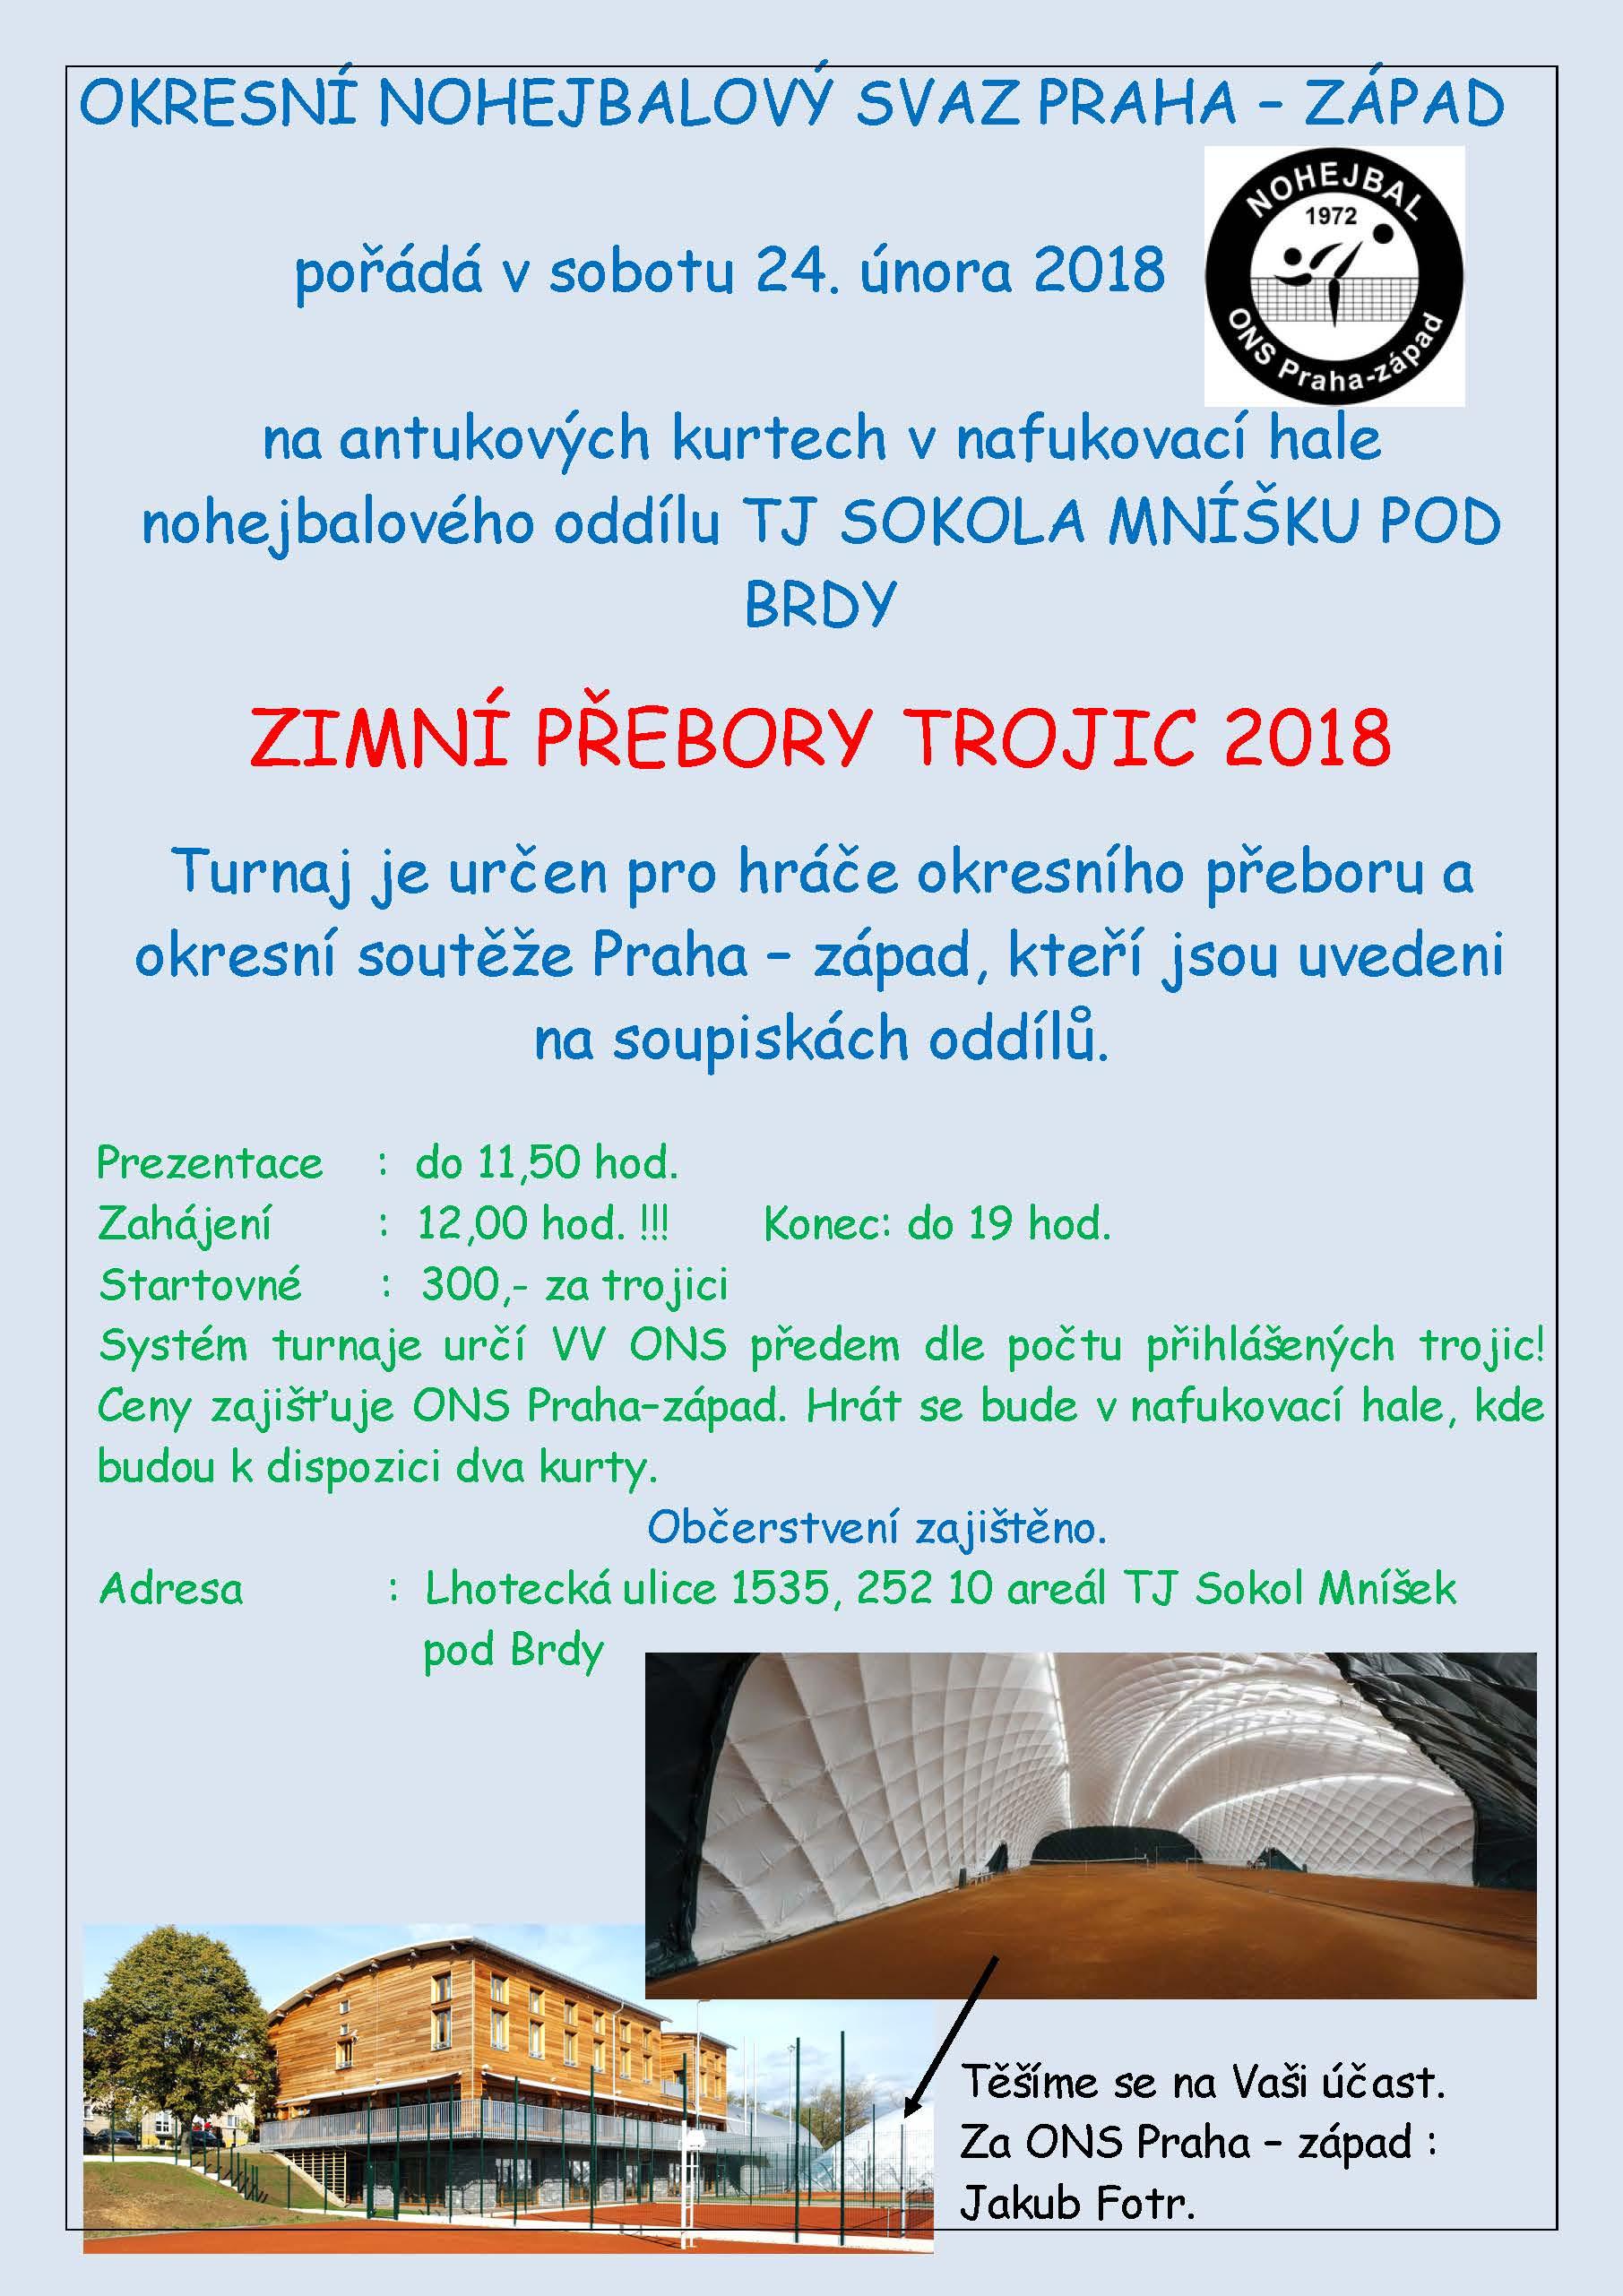 pozvanka-zimni-pohar-trojic-2018.jpg